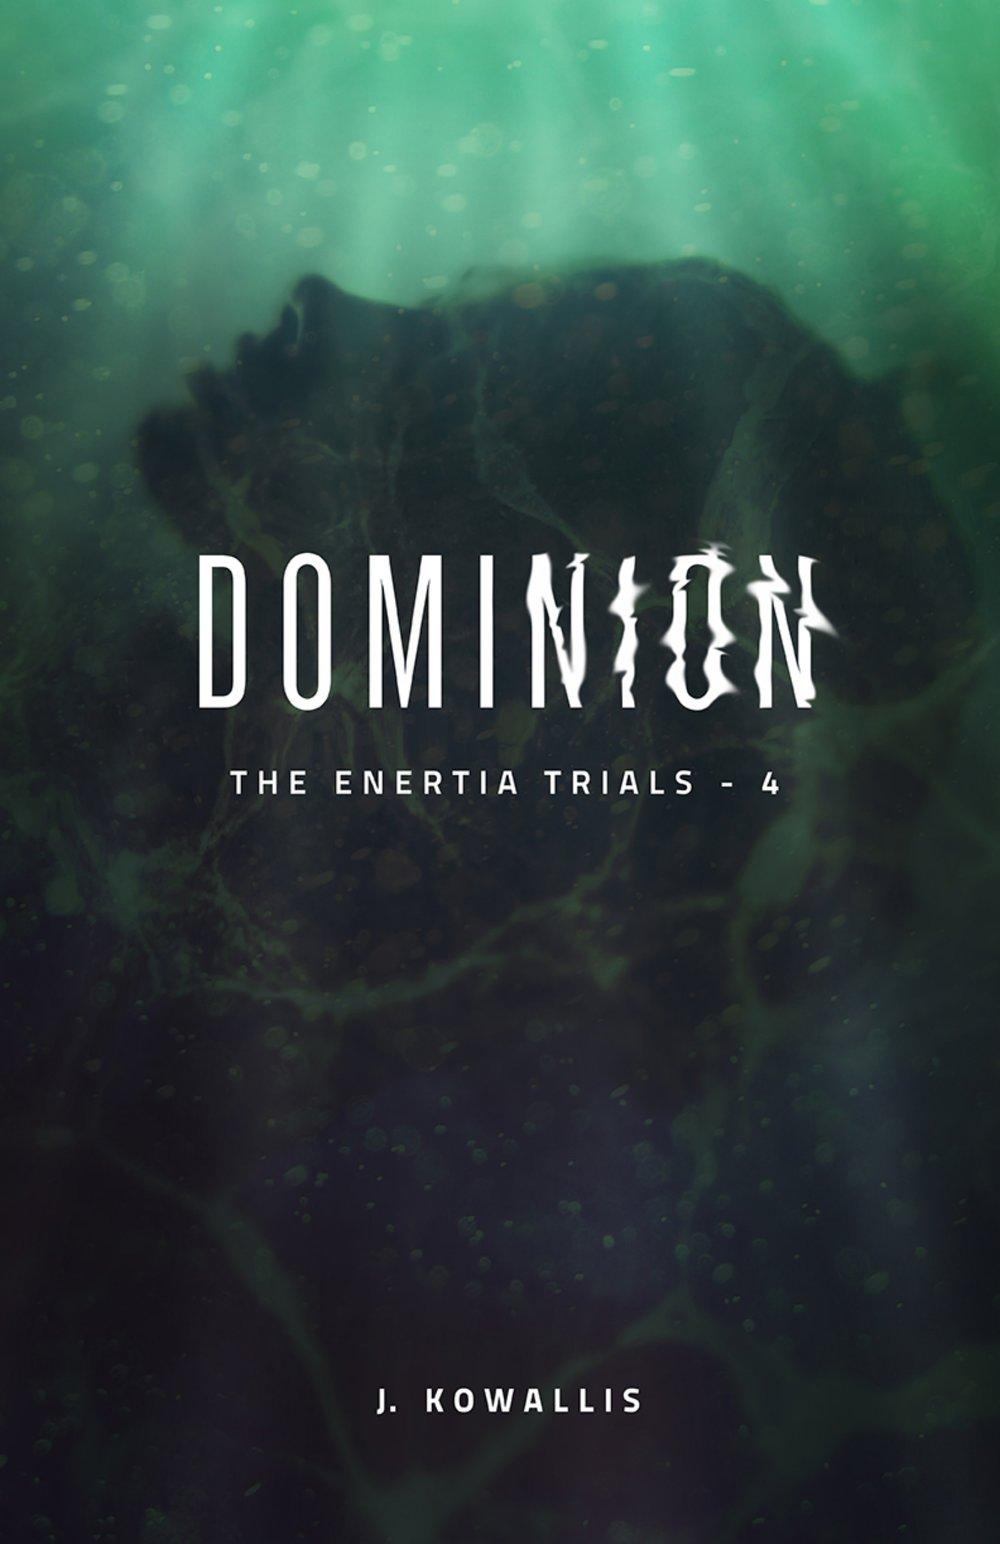 Dominion Cover Final_WEB.jpg